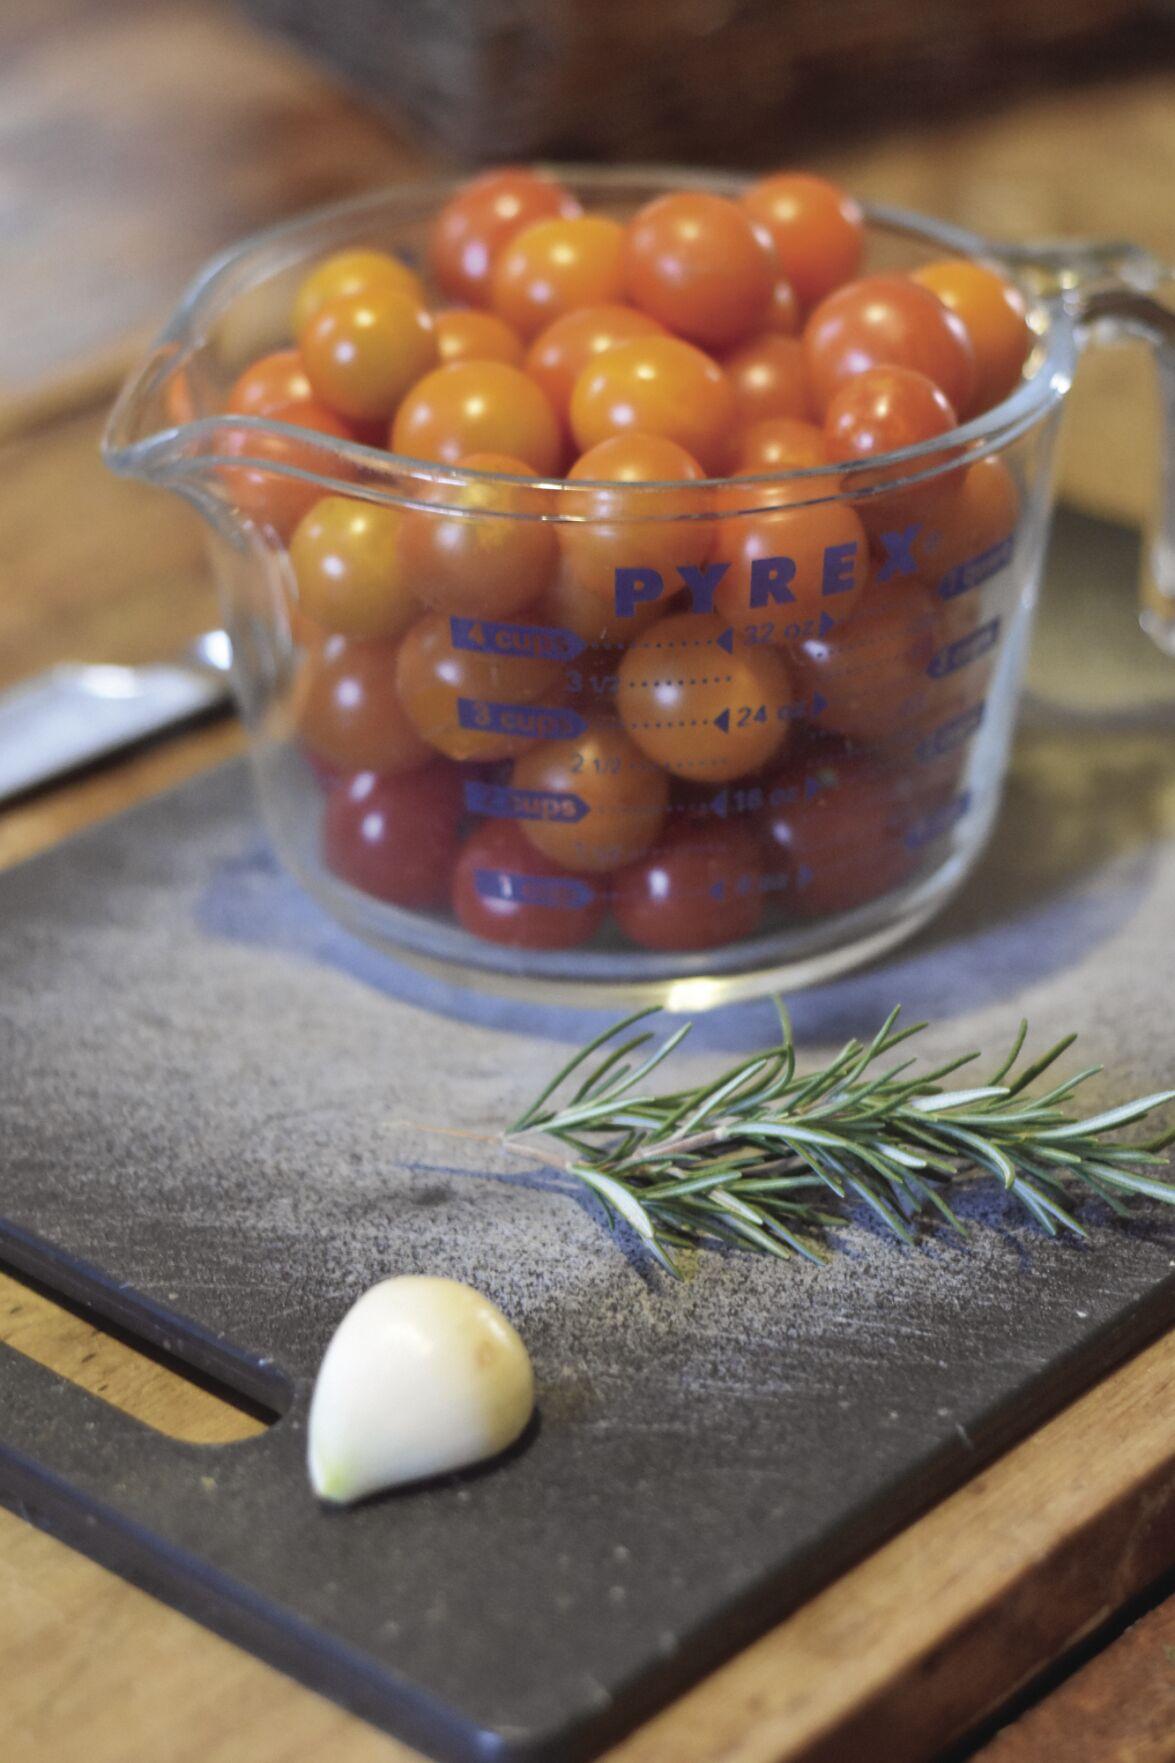 09-17 Tomatoes ingredients